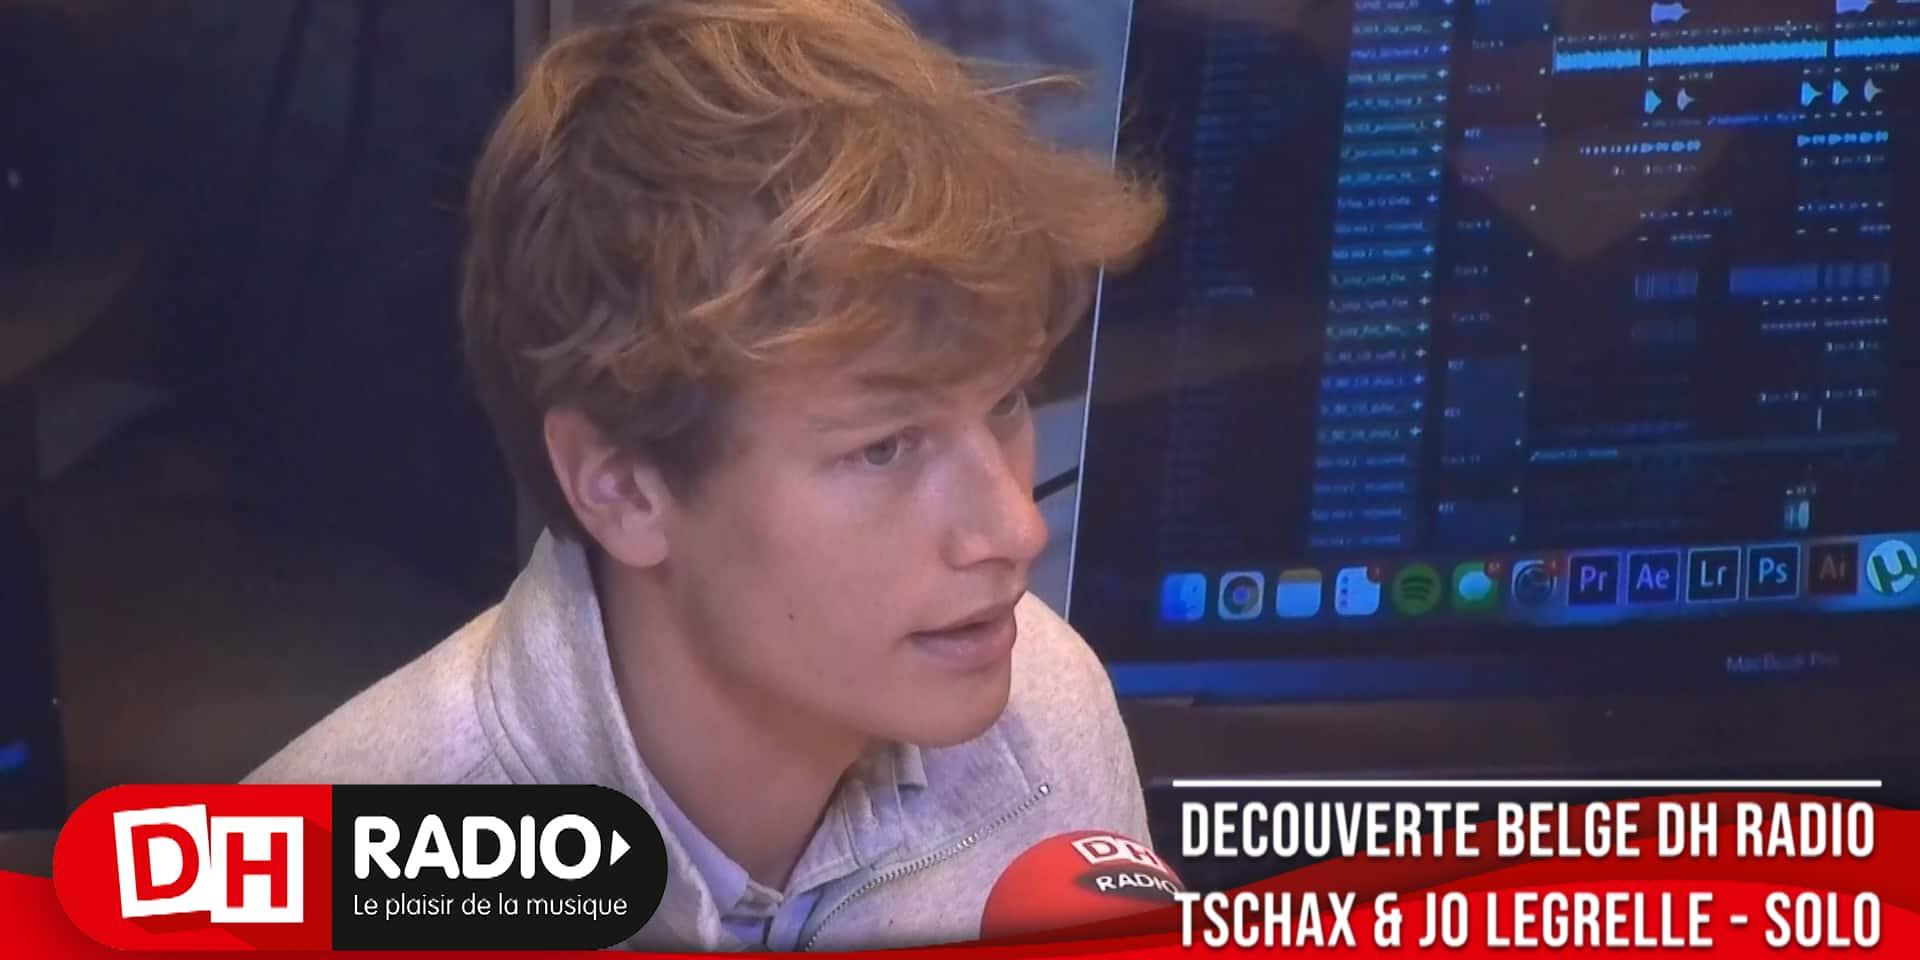 Tschax, découverte belge DH Radio